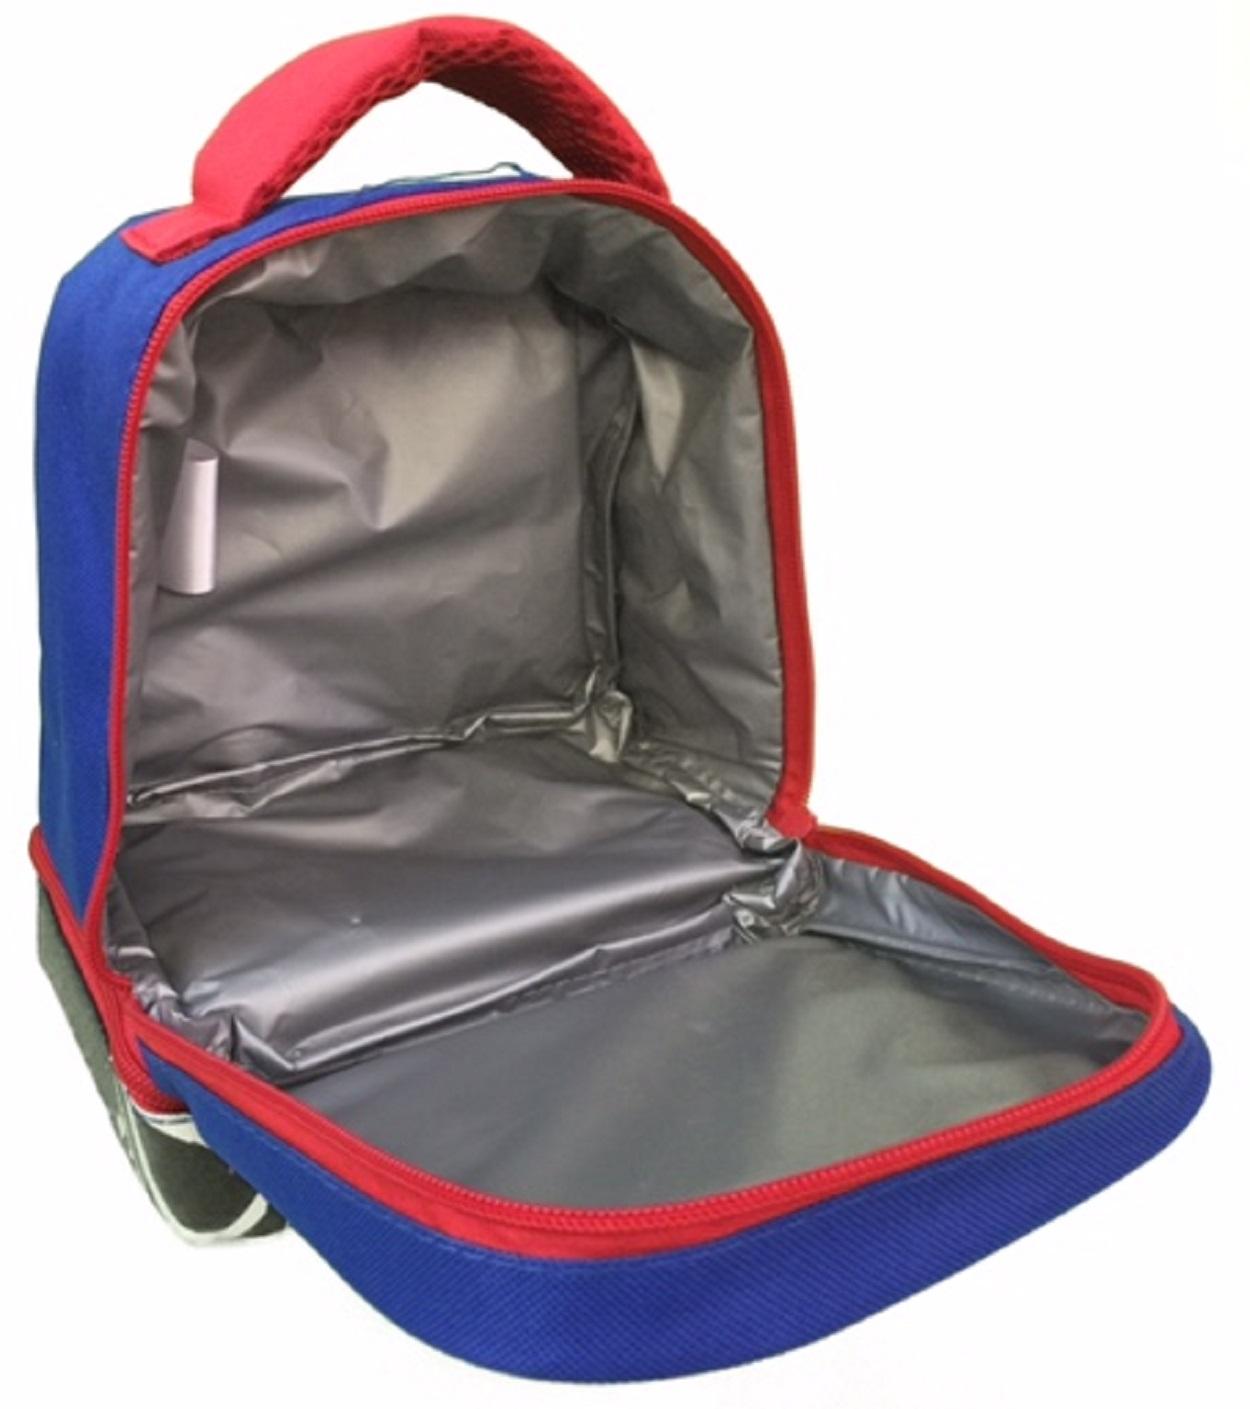 Spiderman 2 Dual Compartment Lunch Box Lunch Bag - Head Shot - Partytoyz Inc.  sc 1 st  Partytoyz & Spiderman 2 Dual Compartment Lunch Box Lunch Bag - Head Shot ... Aboutintivar.Com